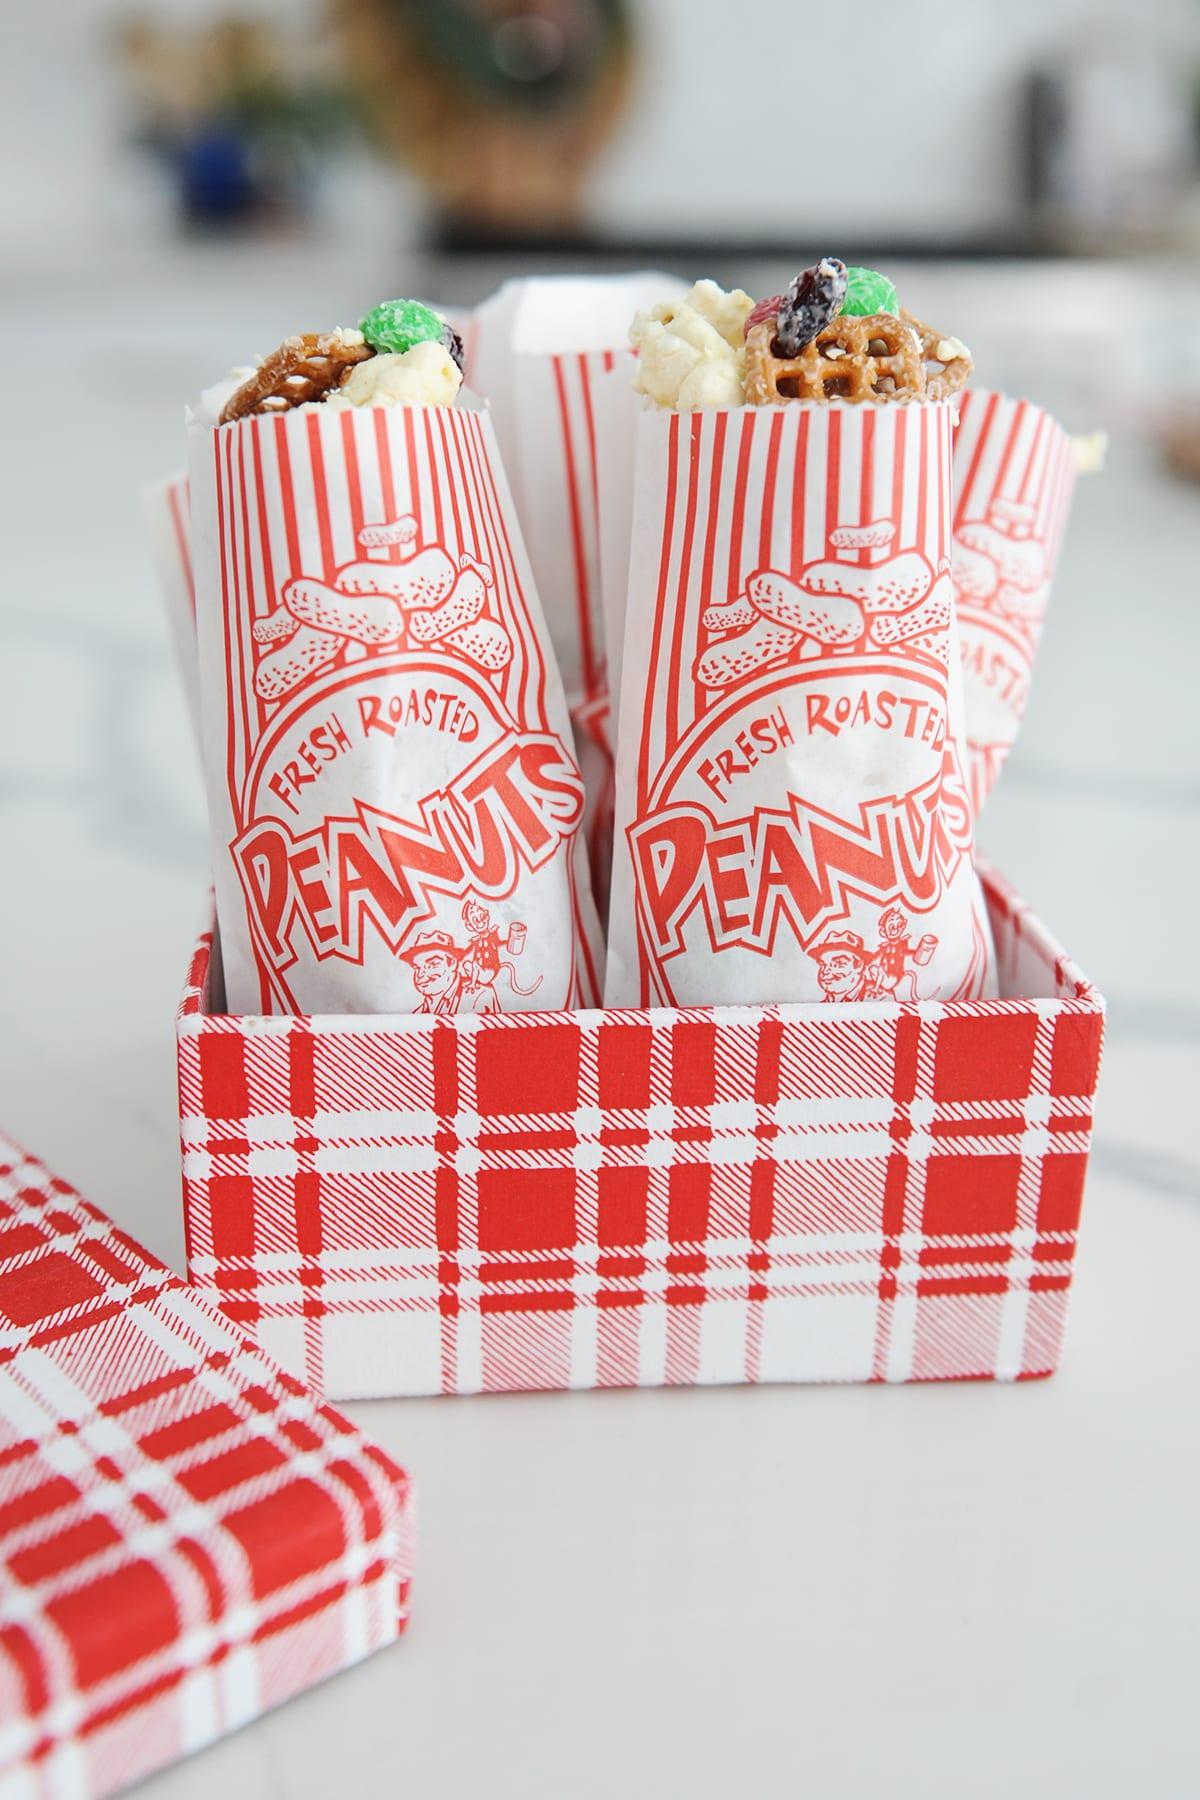 How to make popcorn mix recipes